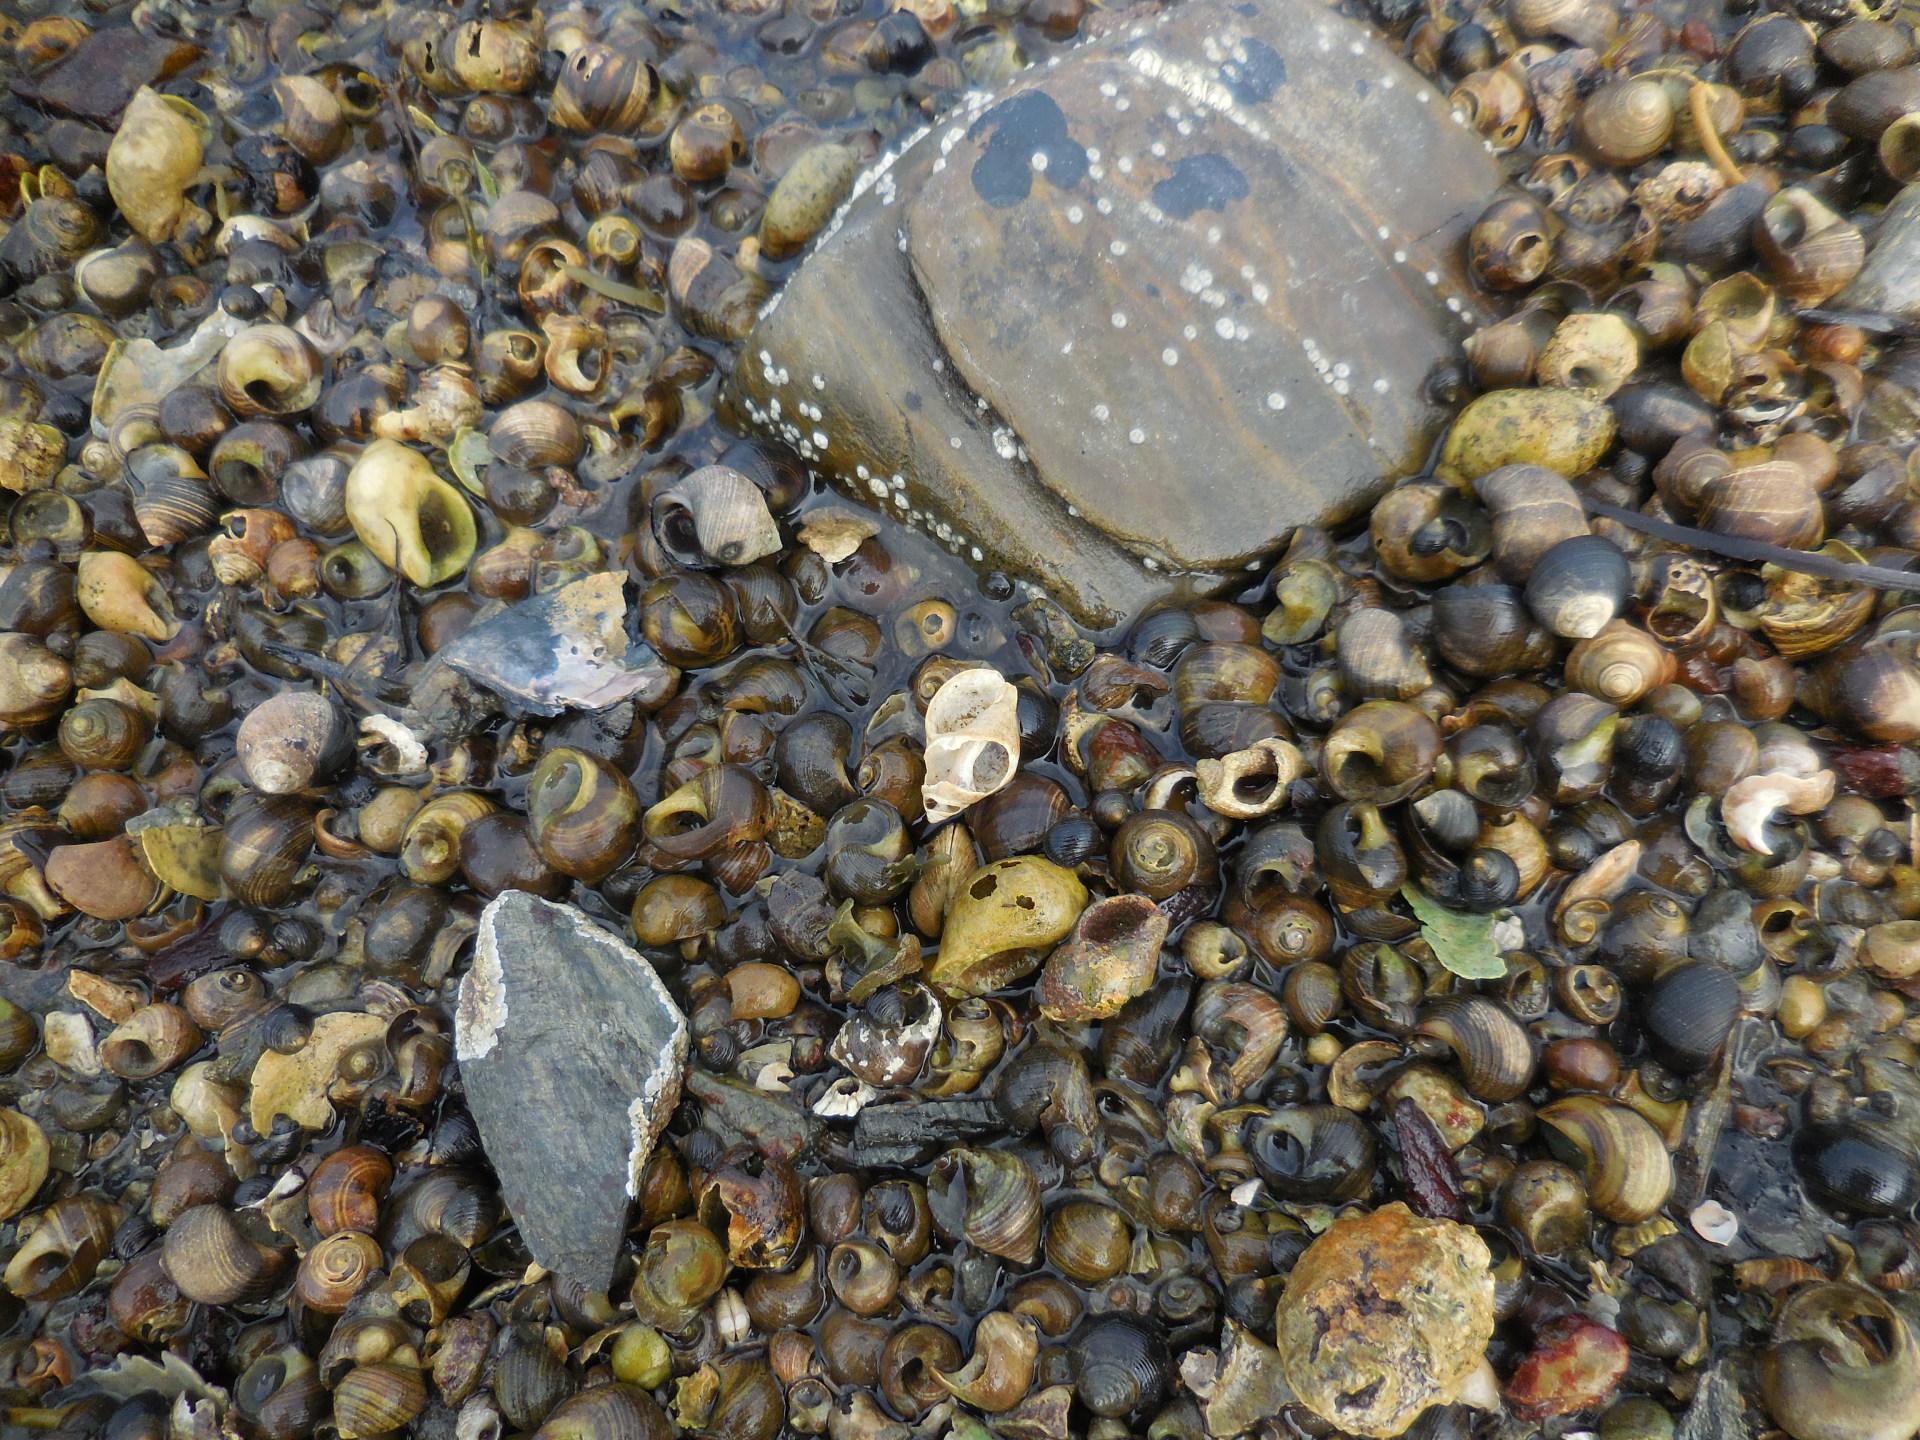 The autobiographies of snails